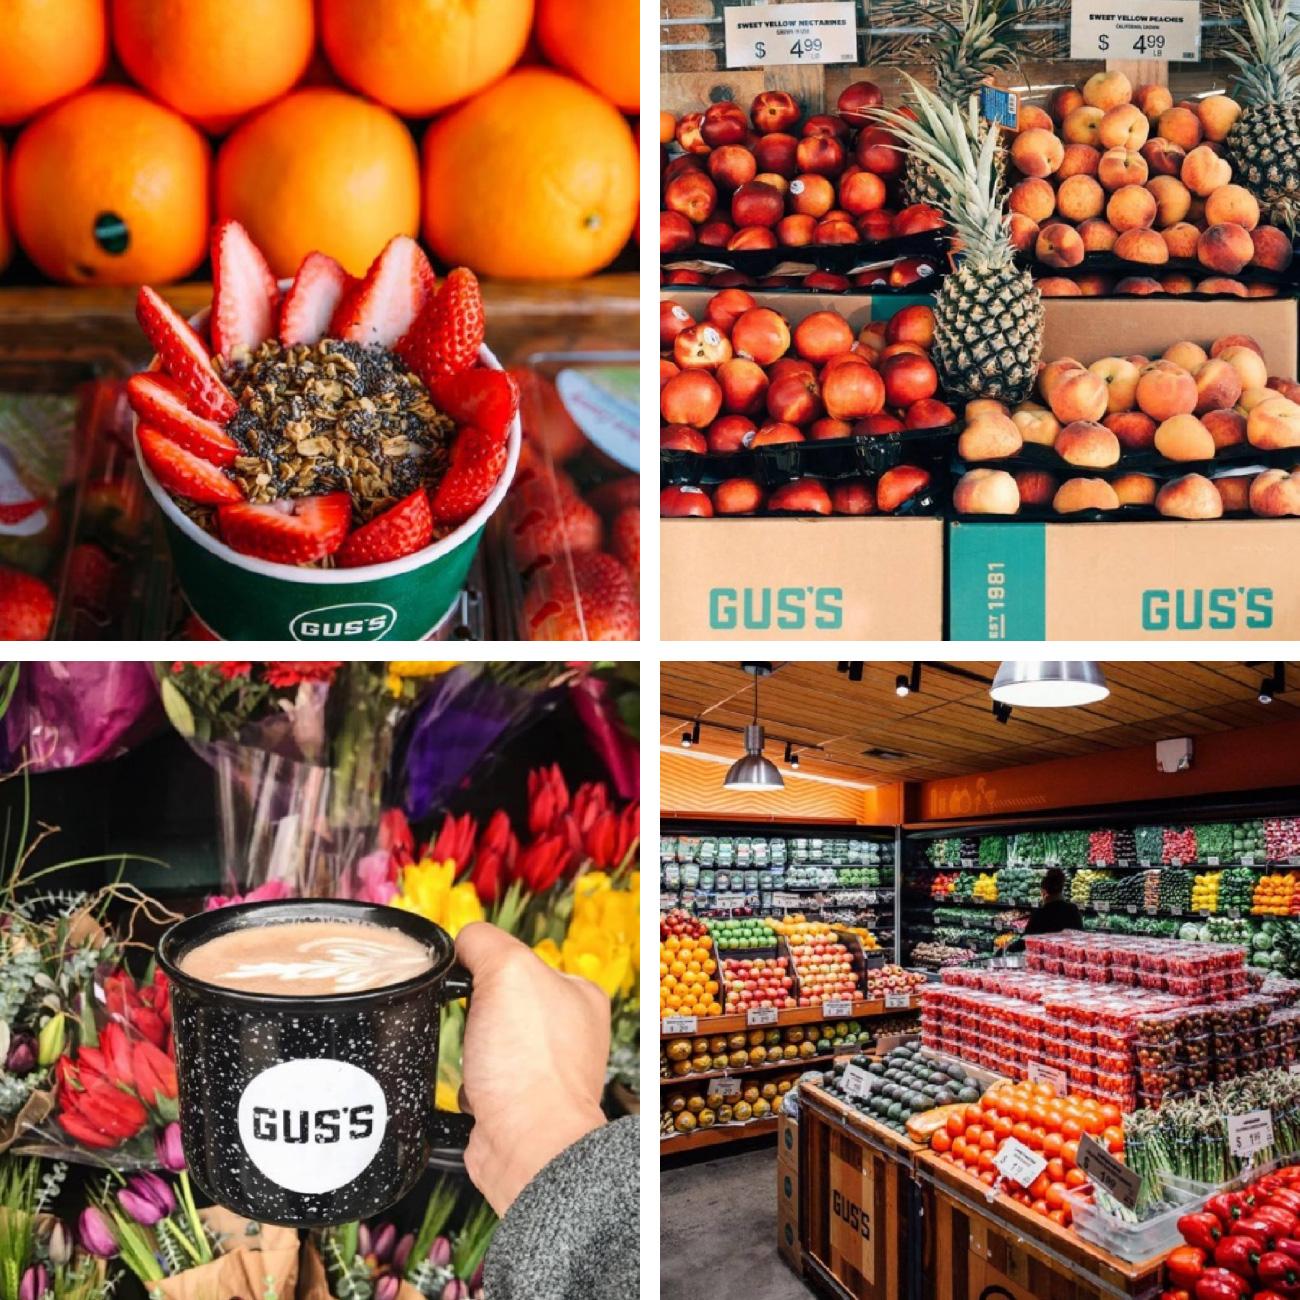 Gus's Market